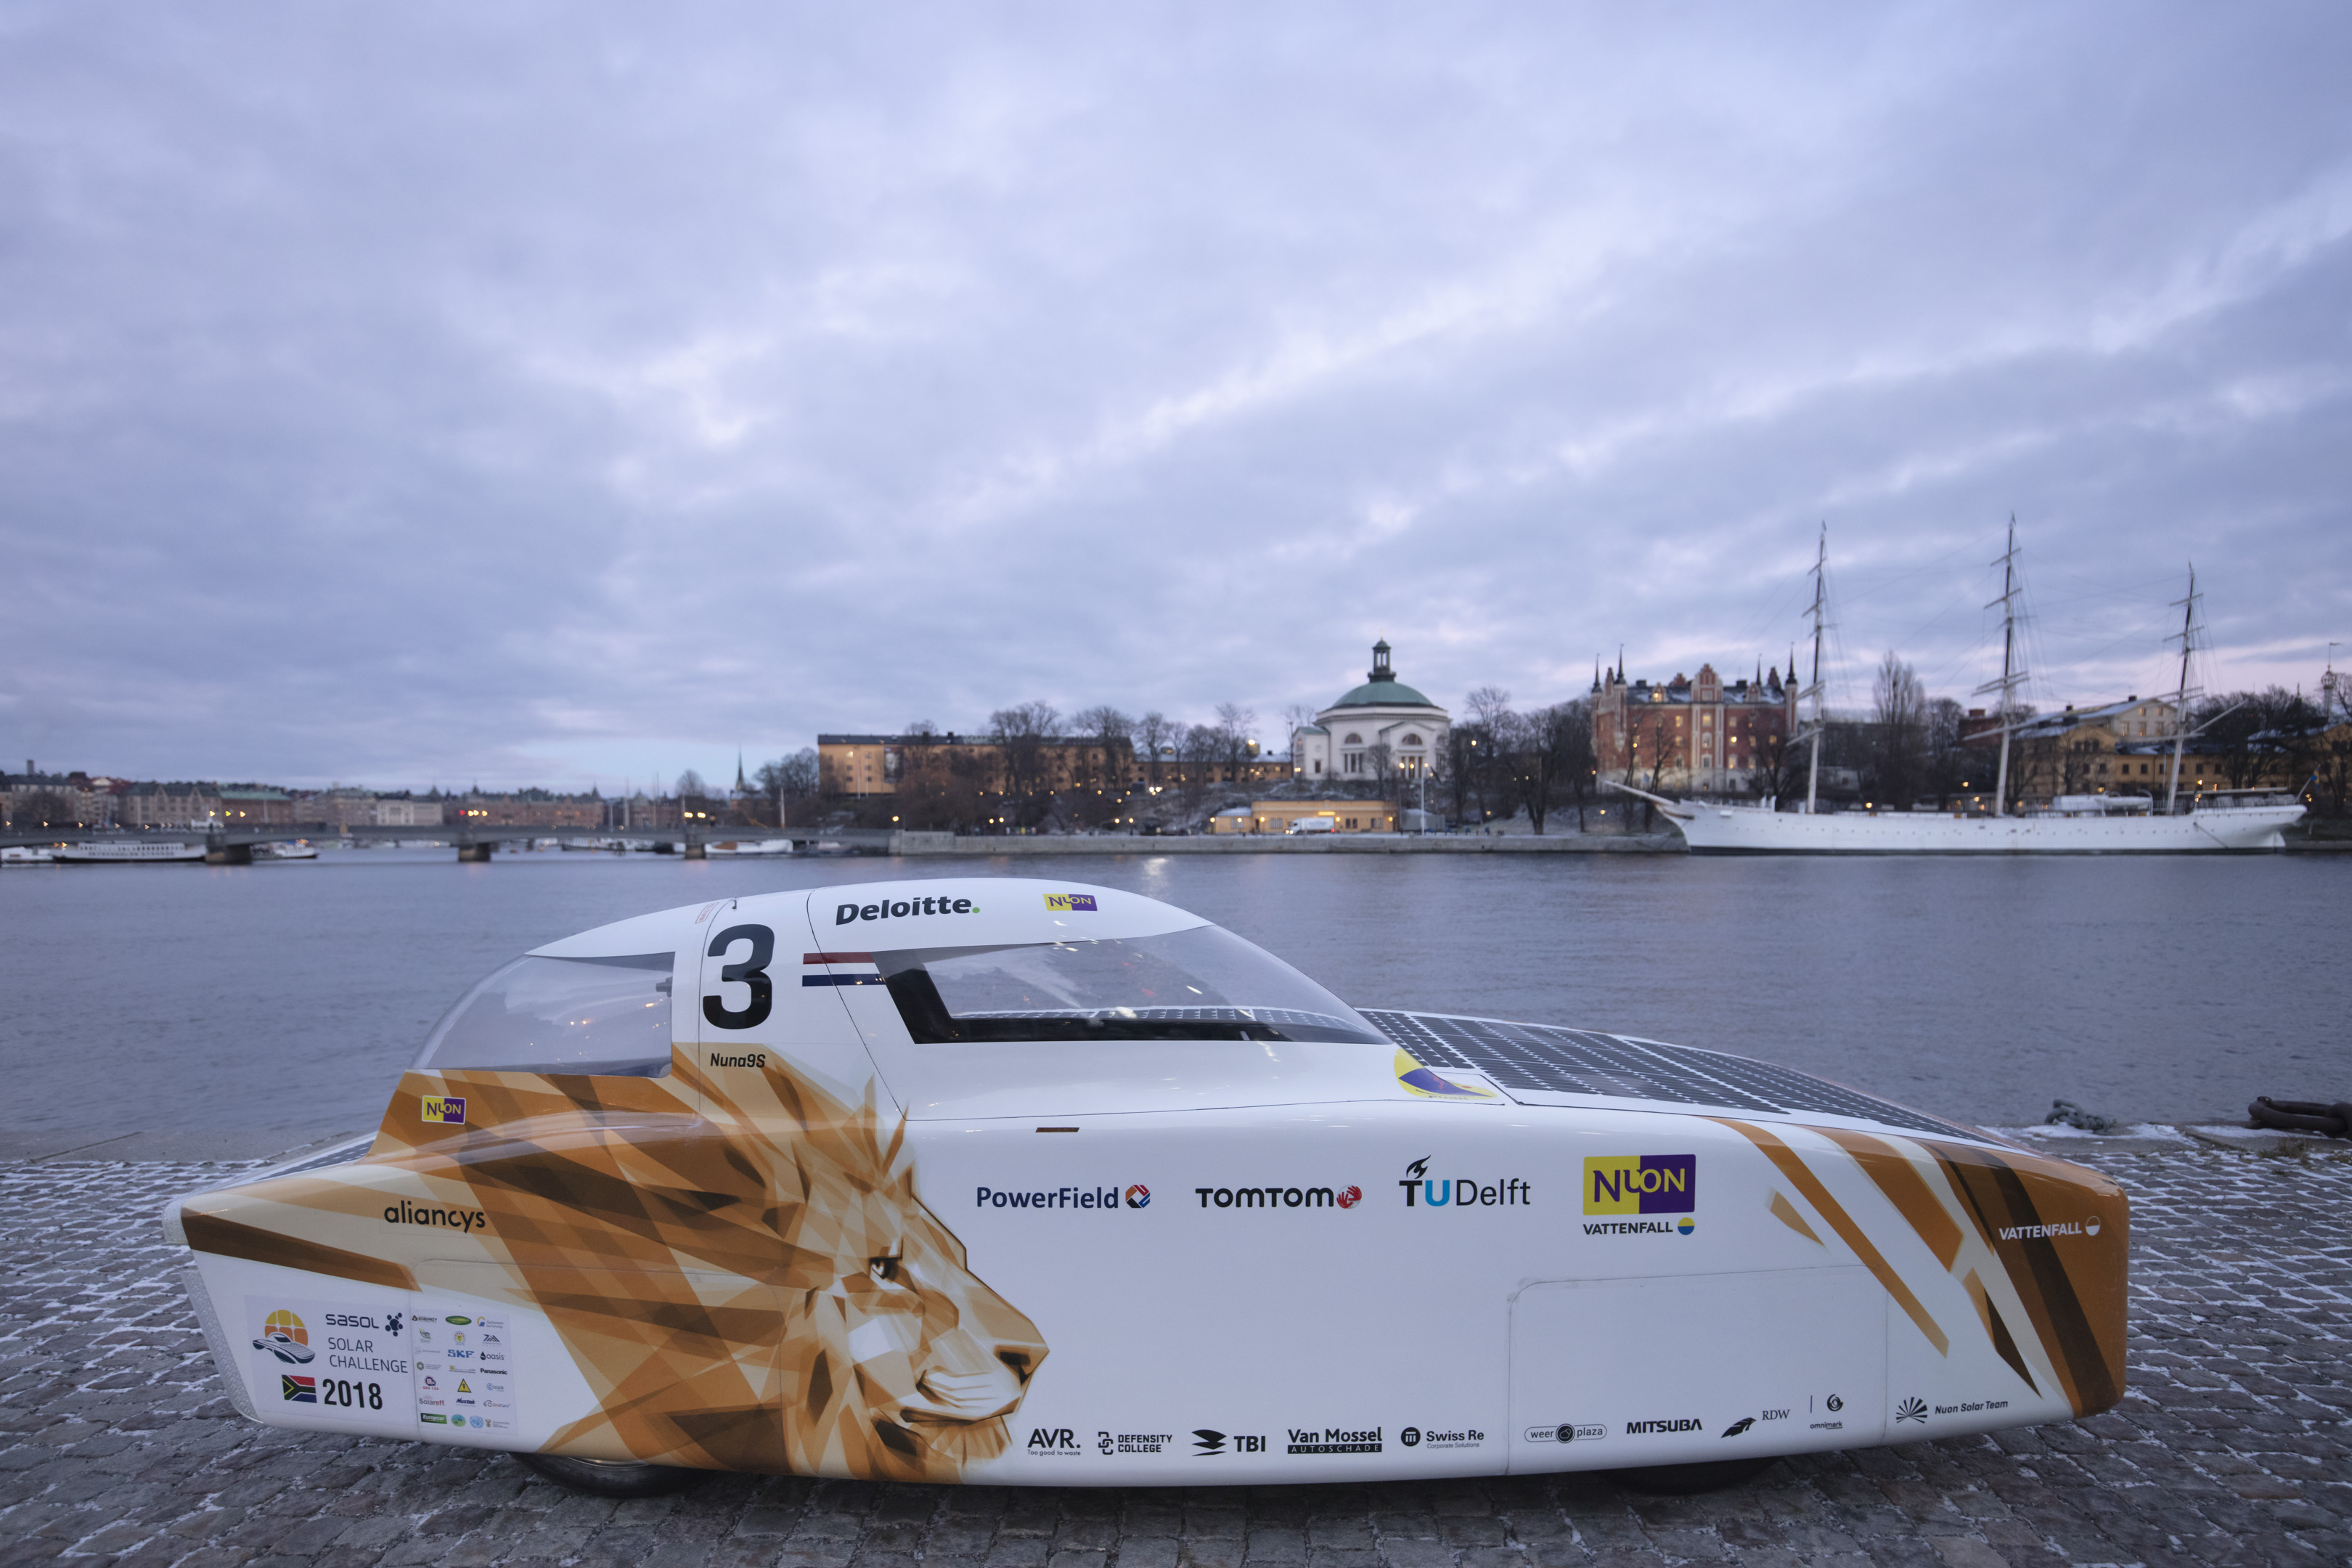 Solbilen Nuna i Stockholm